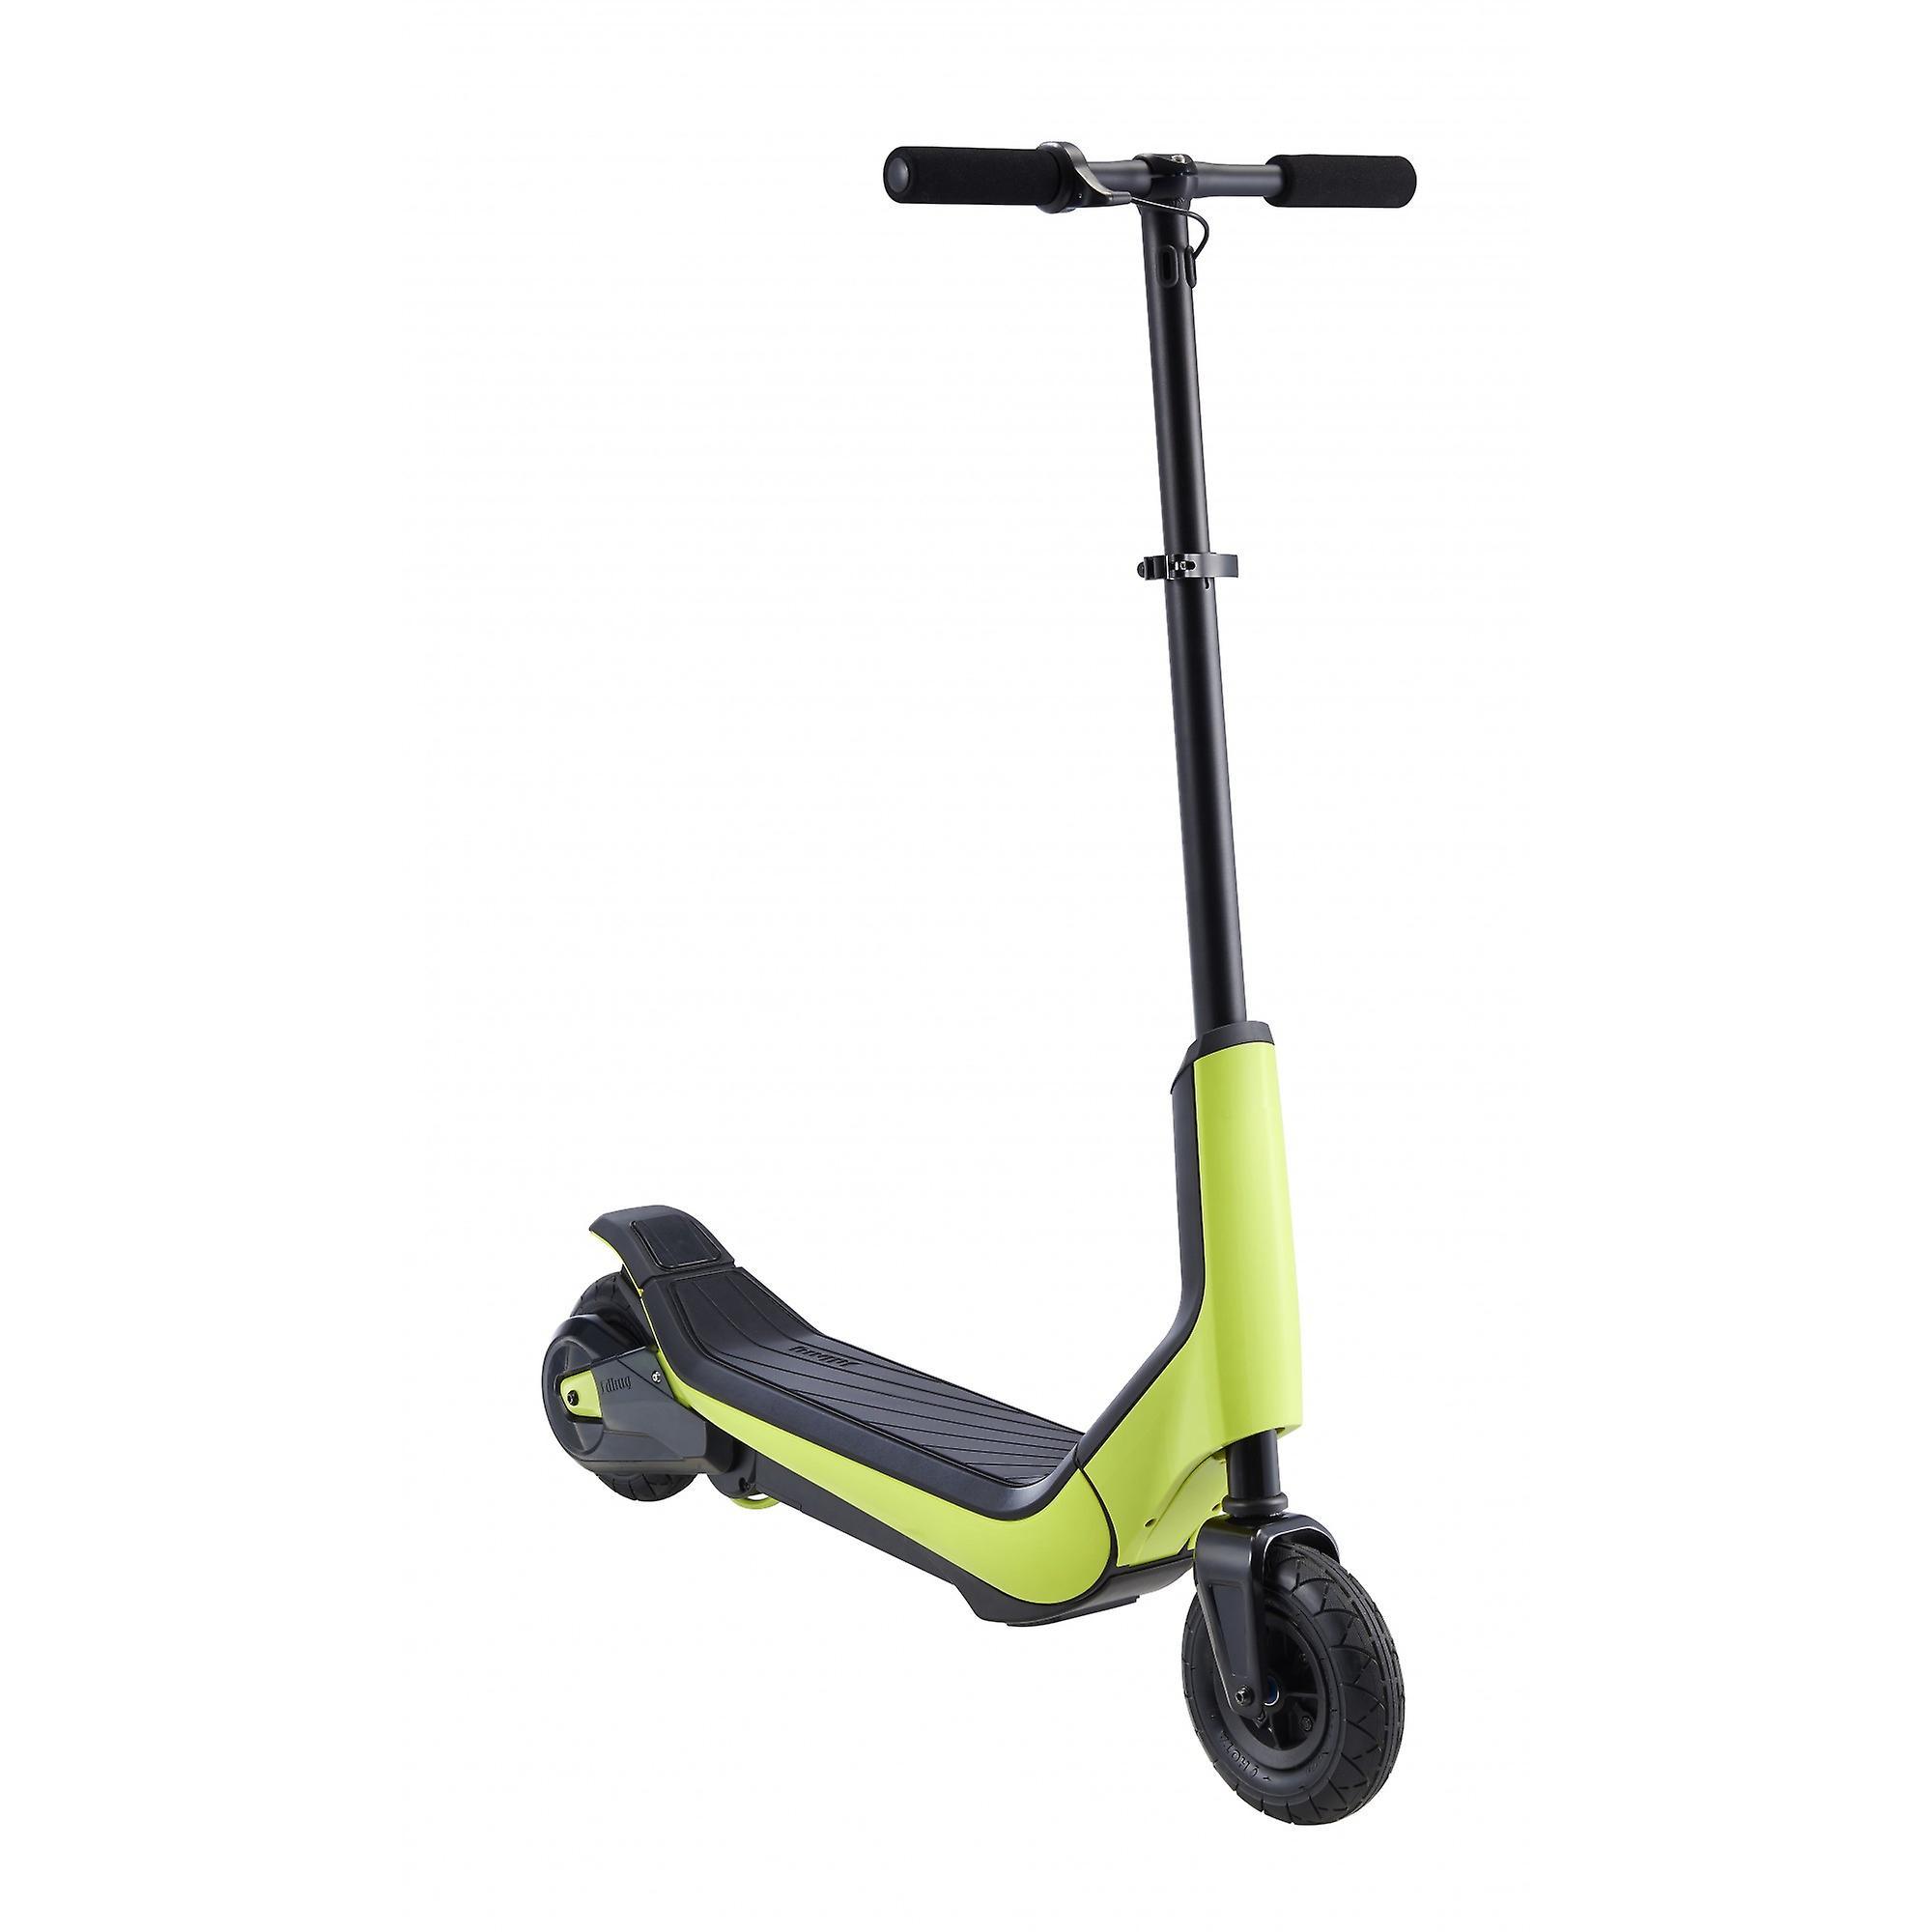 Skateflash E-scooter Green Electric Skateboard